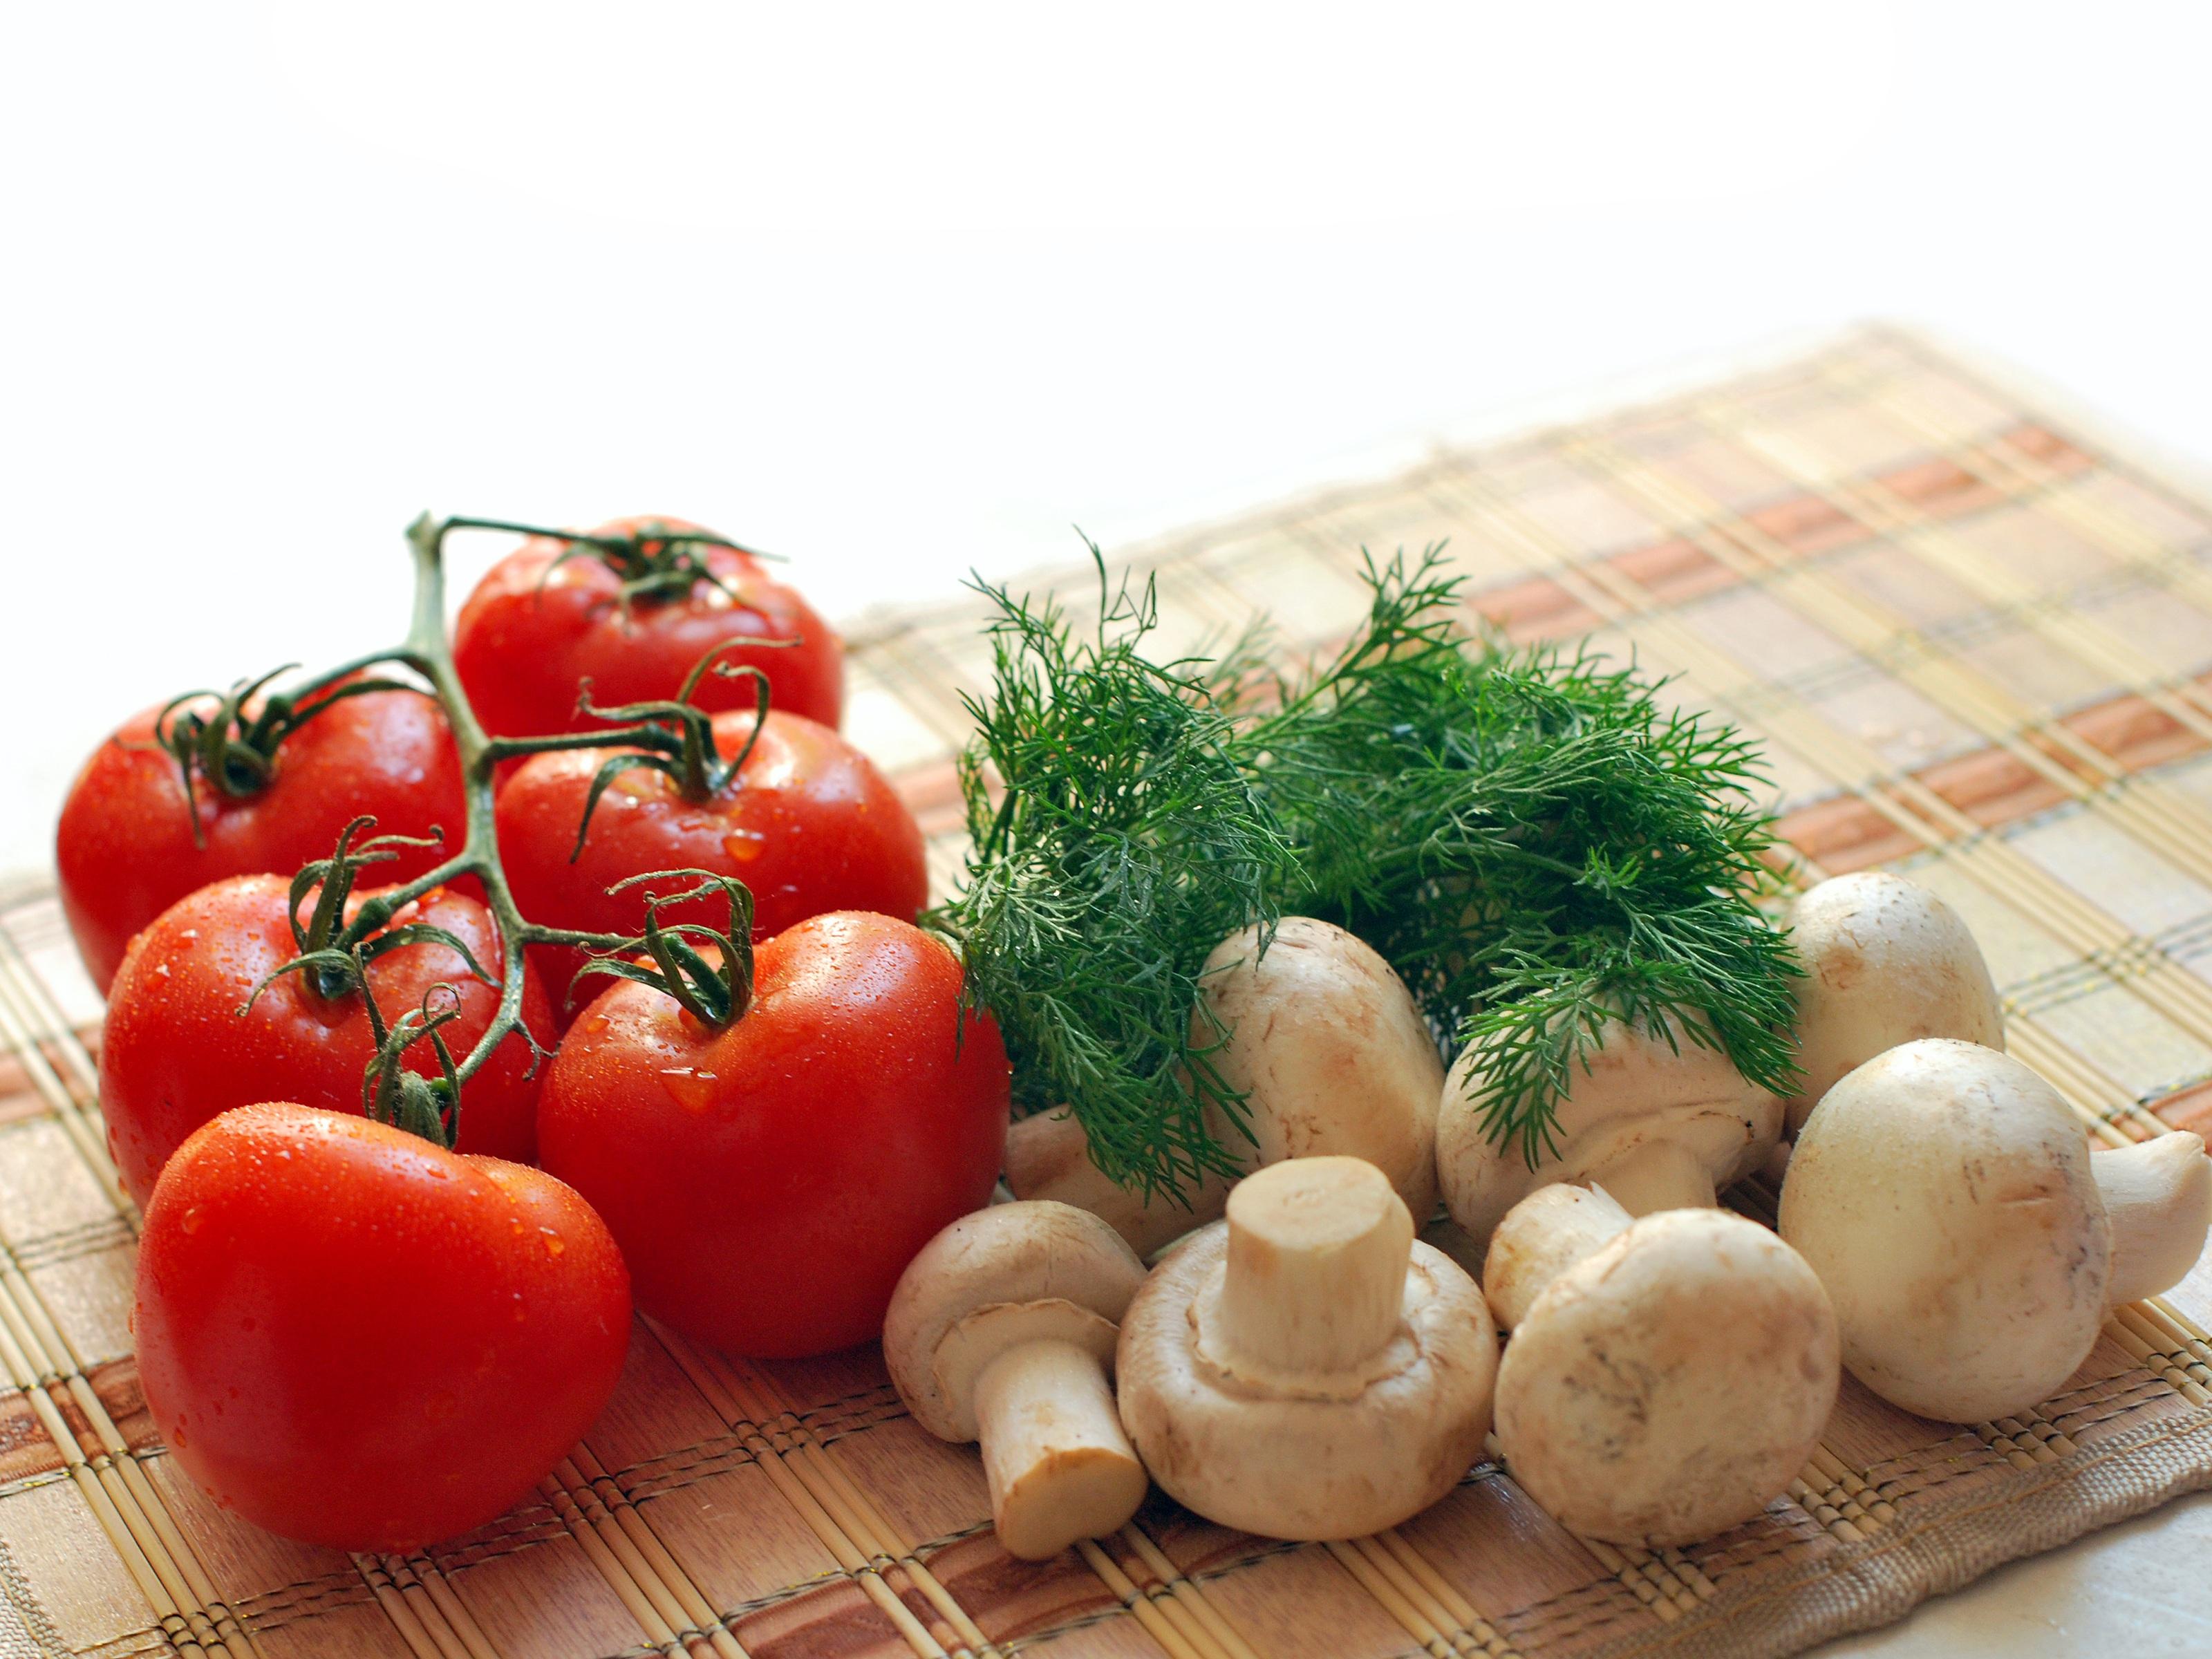 kostenlose foto rustikal sommer reif gericht lebensmittel salat gr n rot produzieren. Black Bedroom Furniture Sets. Home Design Ideas